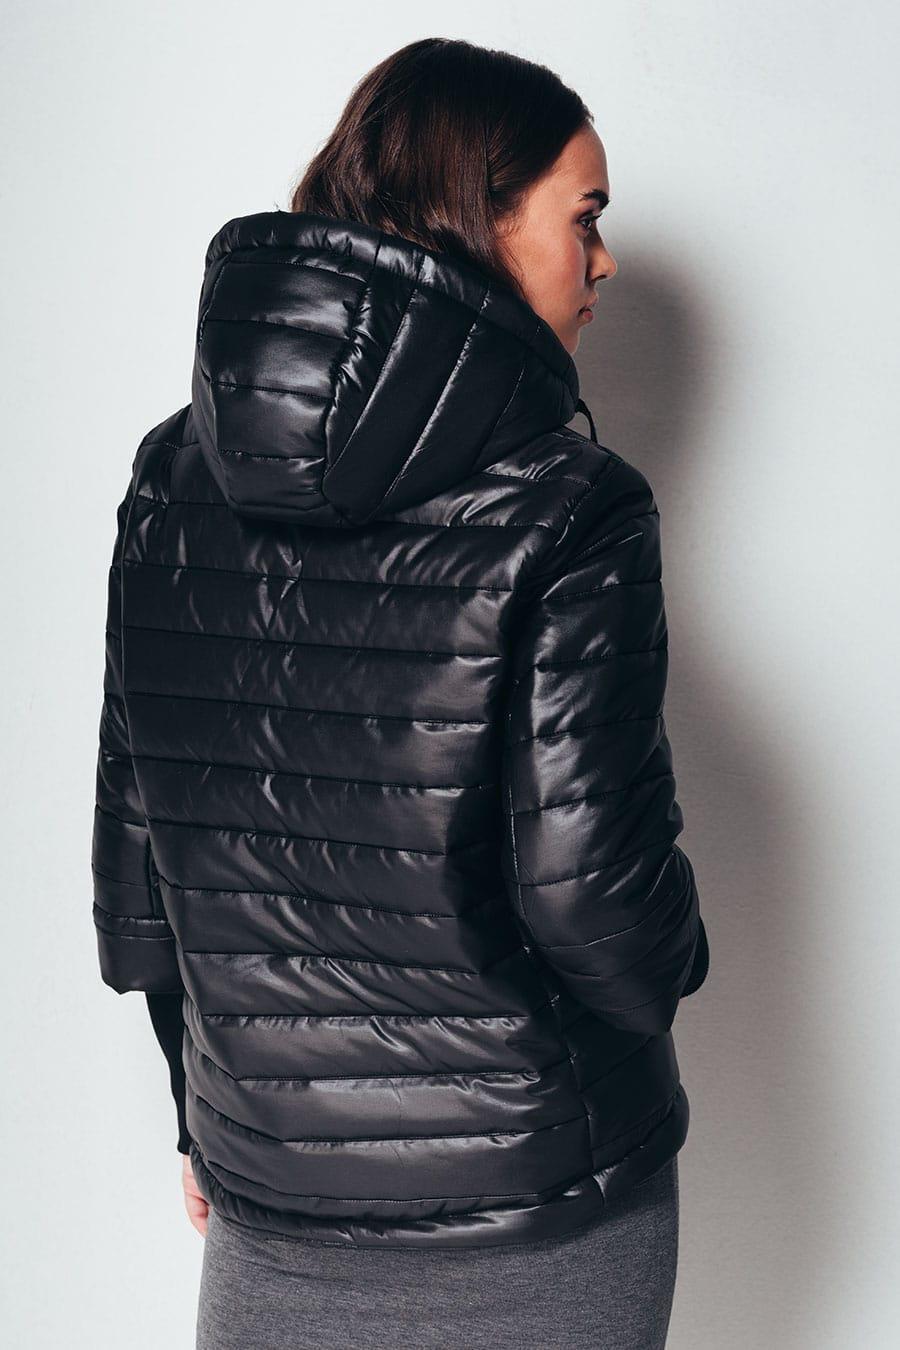 jagger internet prodavnica kolekcija jesen zima 2021 zenska jakna jg 6232 01 6